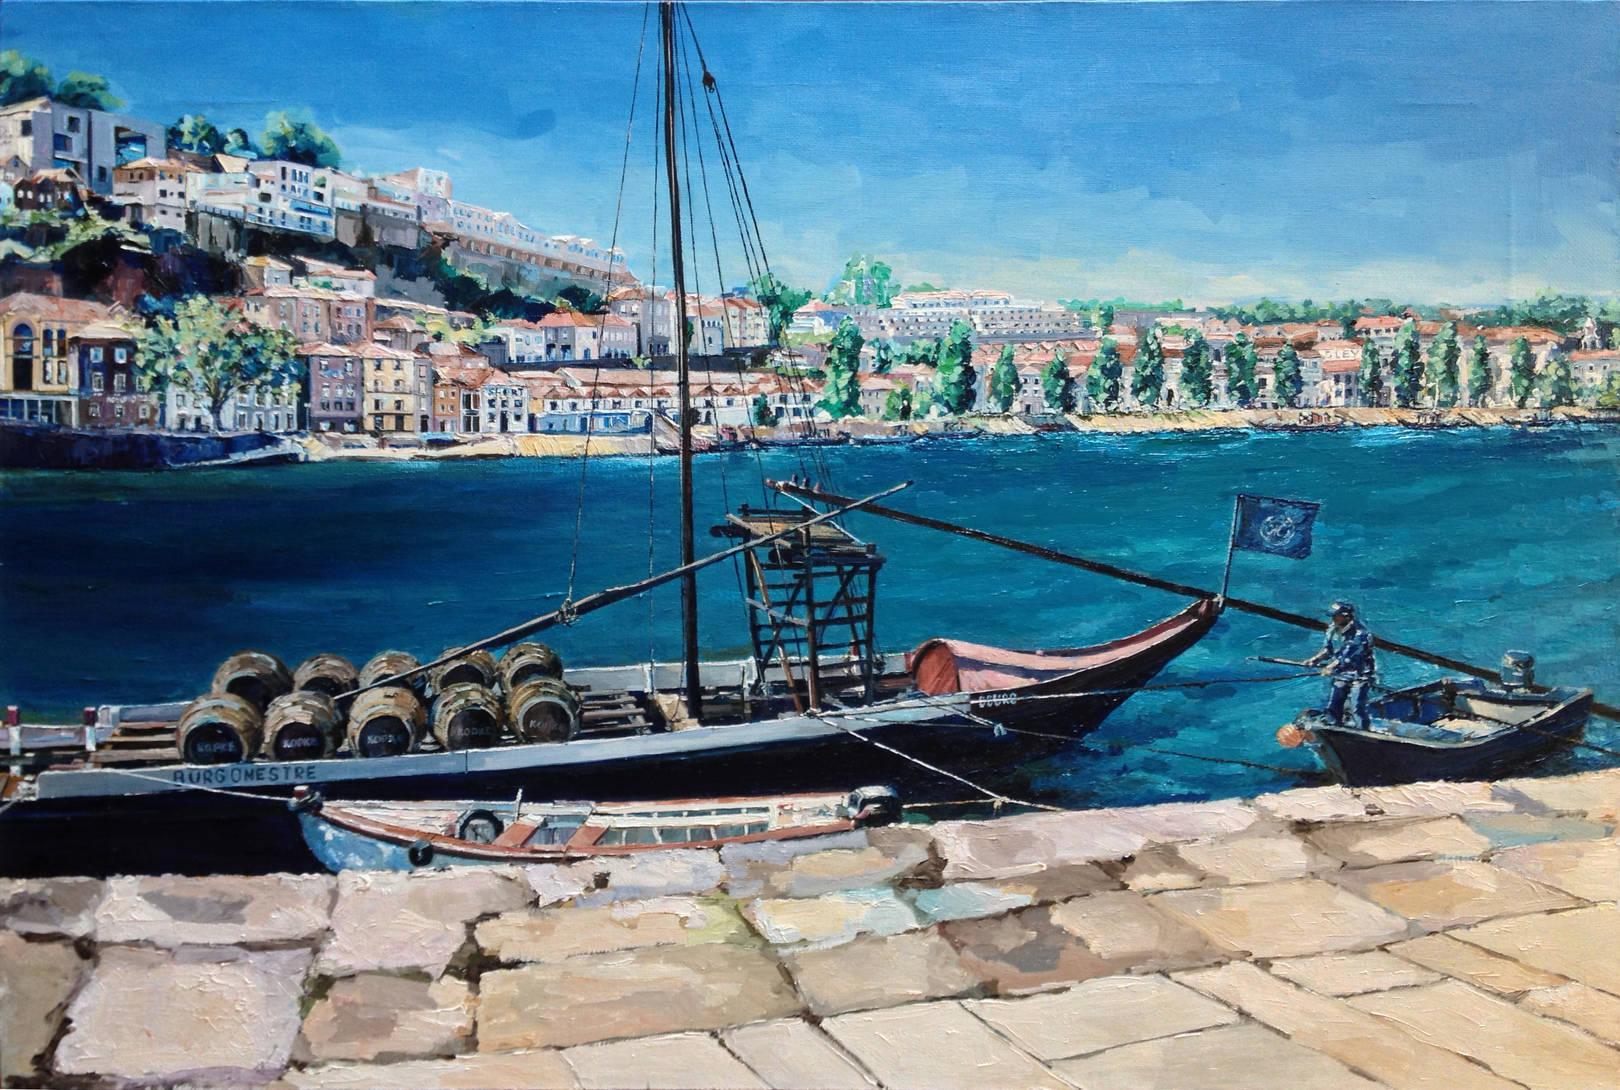 Порту. Португалия. х.м.,60х90, 2014 г.